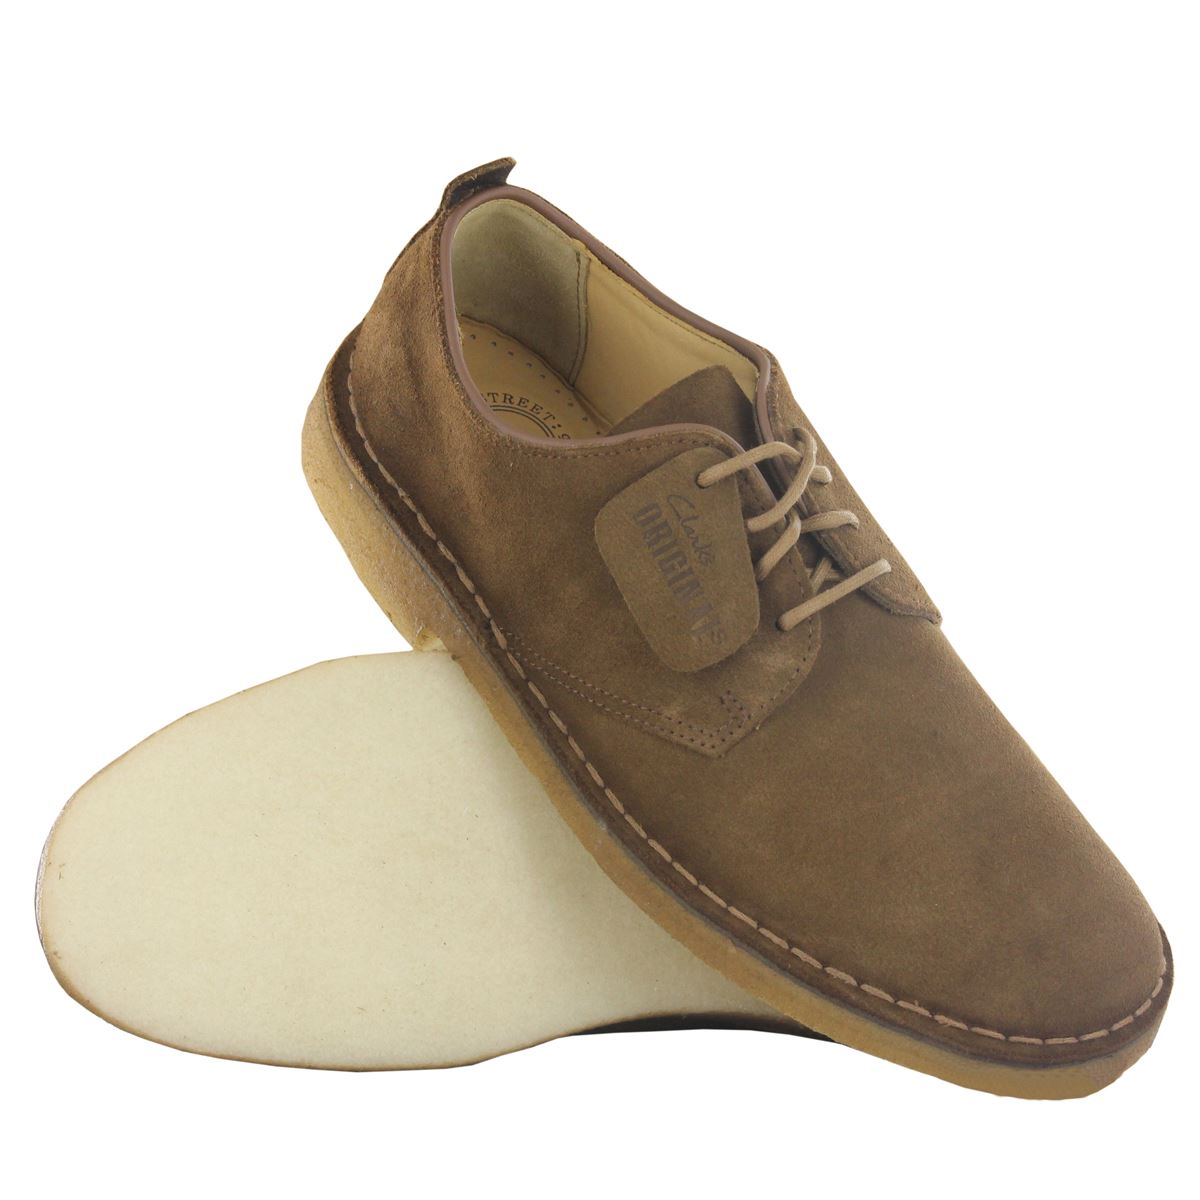 Clarks original classic desert London Daim Cuir Homme Chaussures a